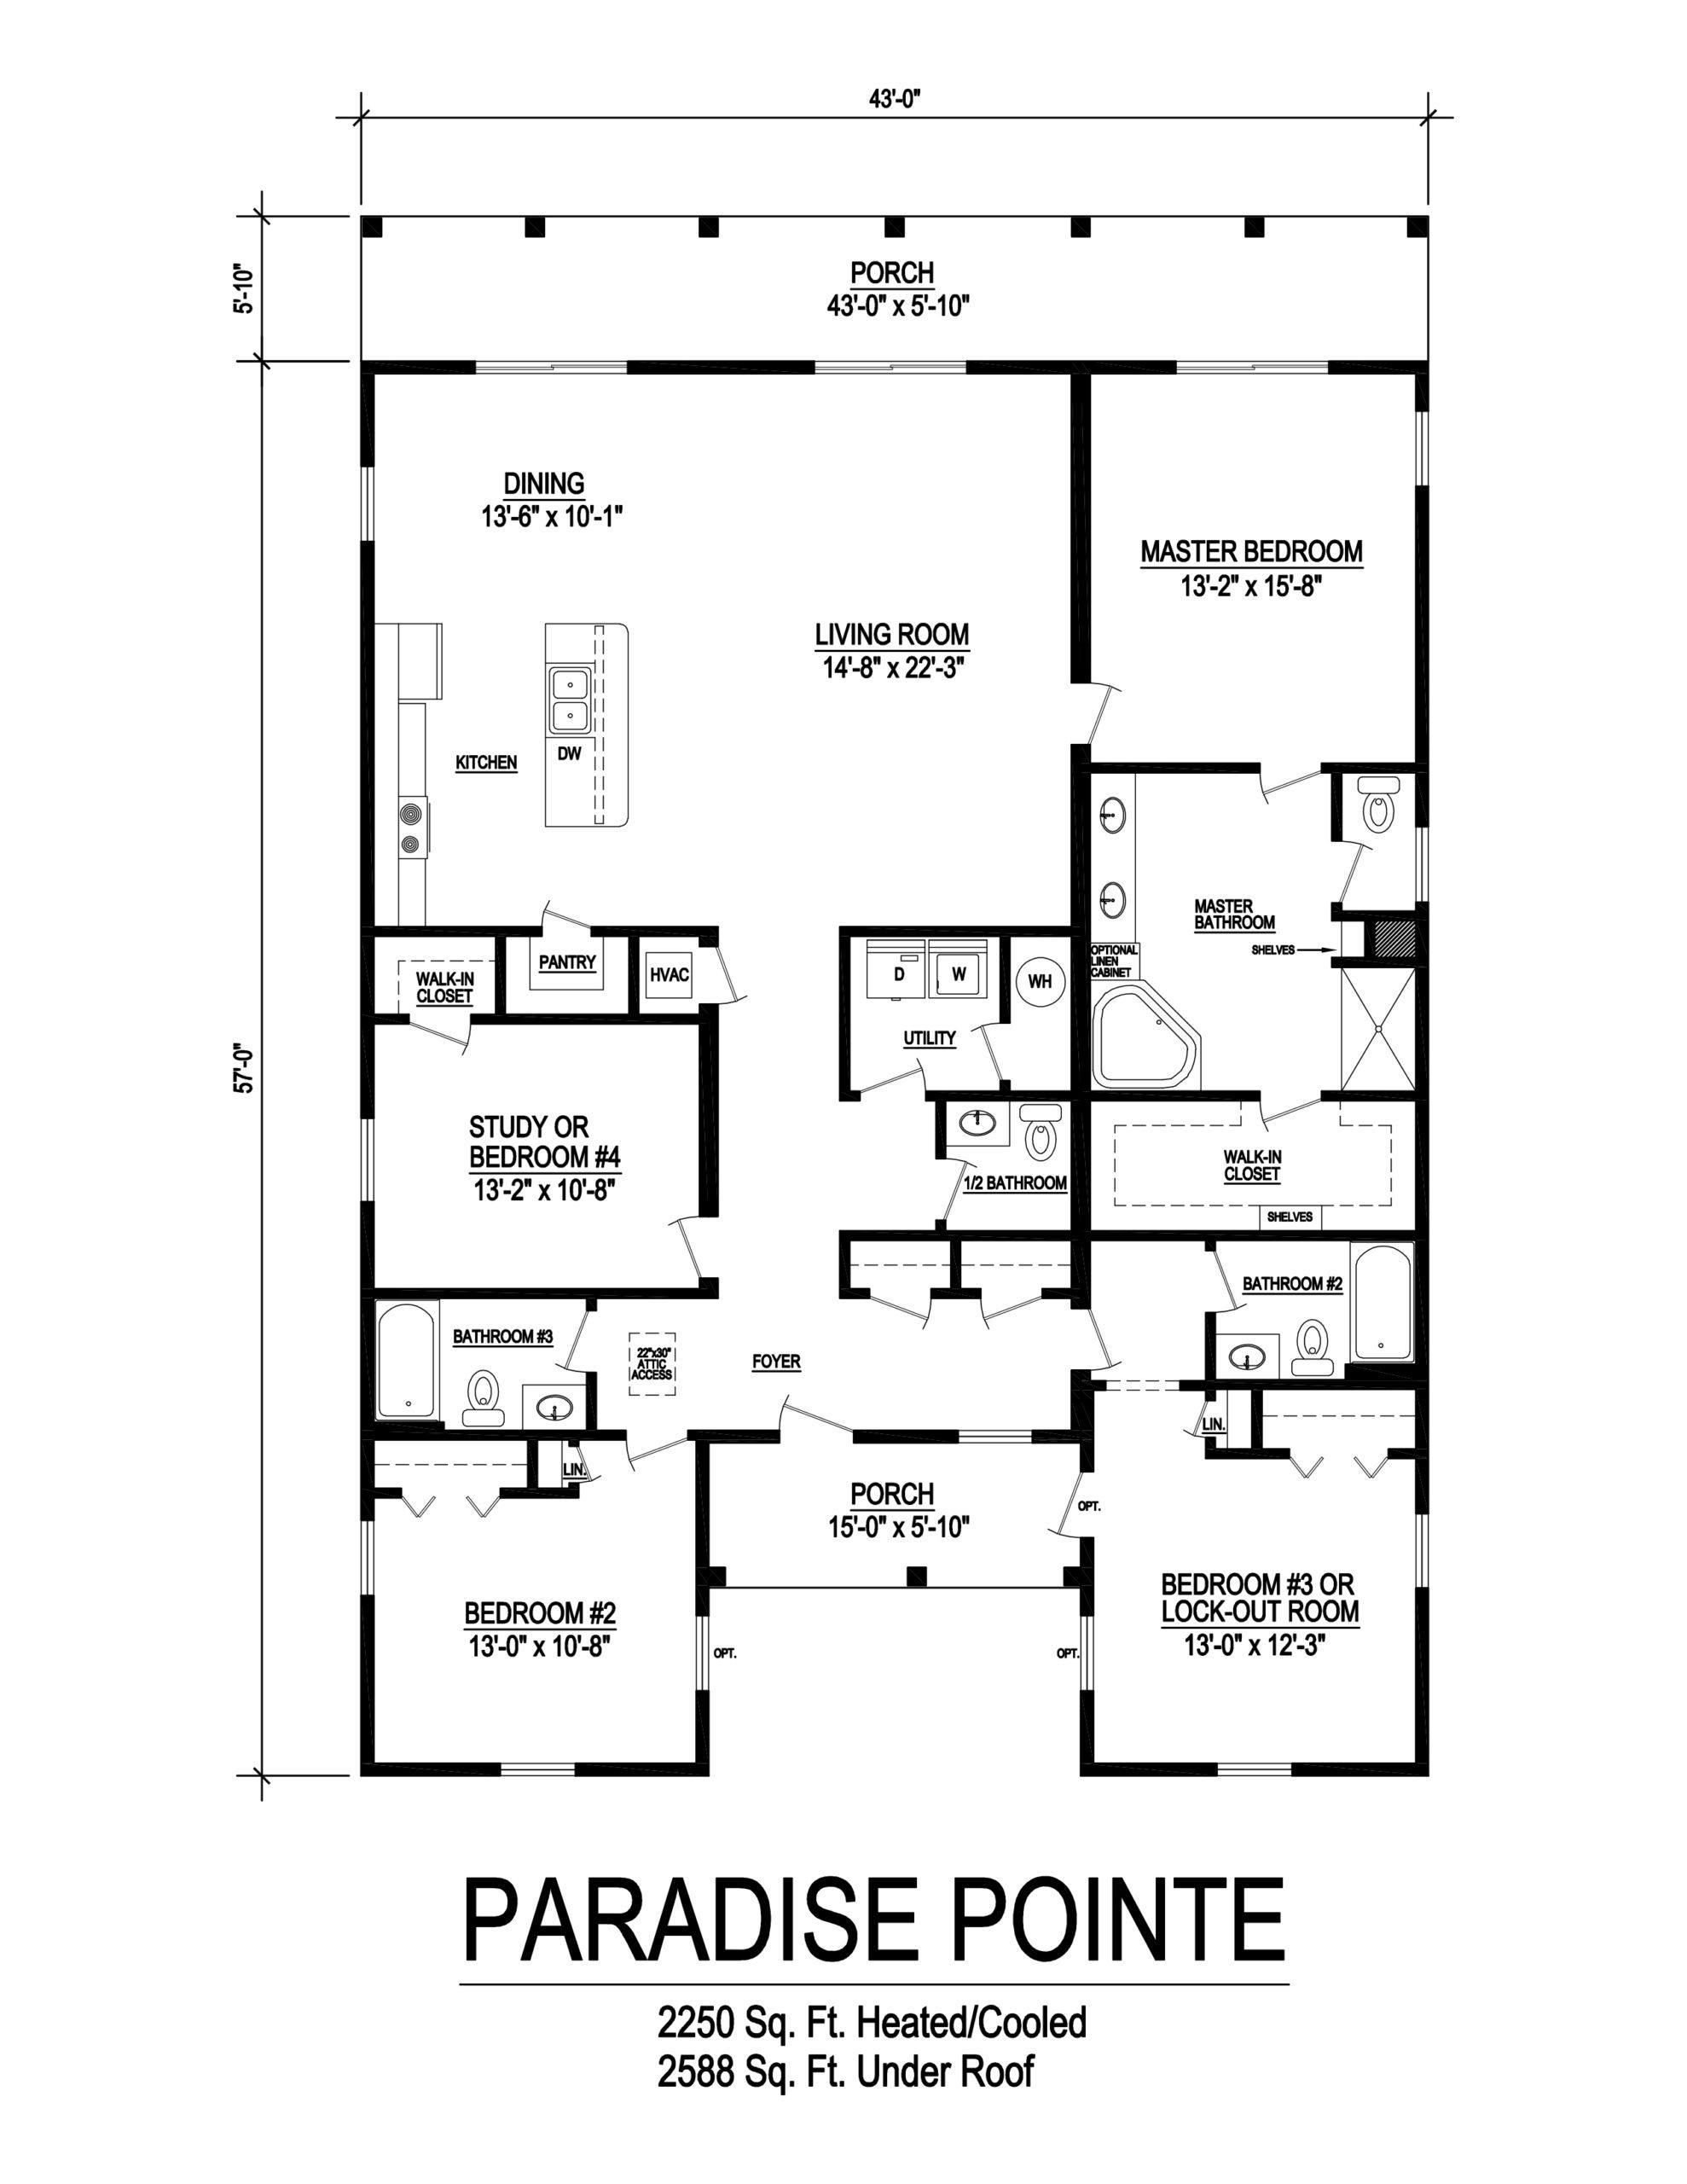 paradise pointe modular home floorplan